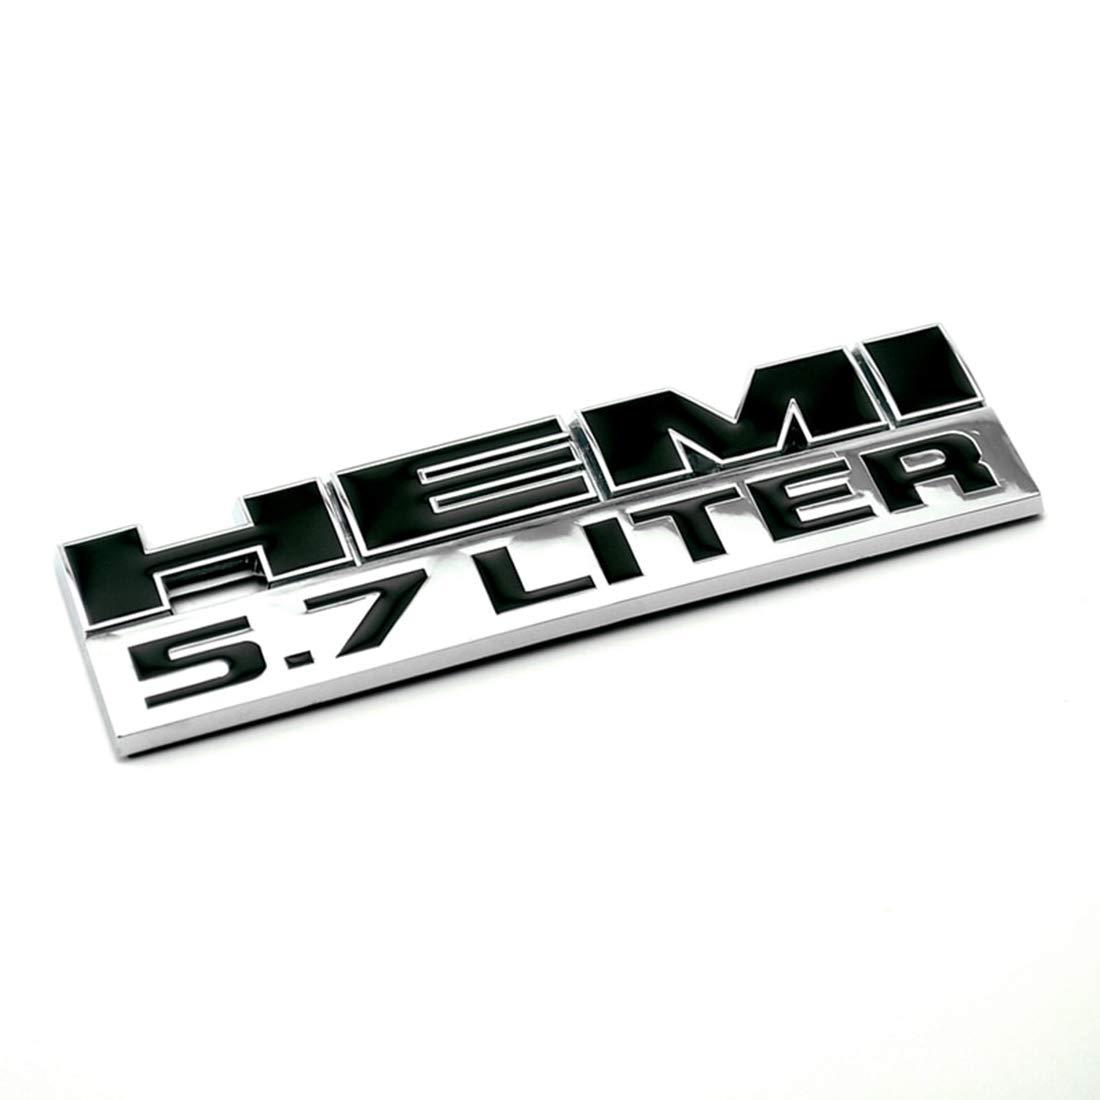 2x RAM 5.7 Liter Hemi 3D Logo Decal Emblem Replacement for Badge Sticker Dodge Charger Ram 1500 Challenger Jeep Grand Emzscar